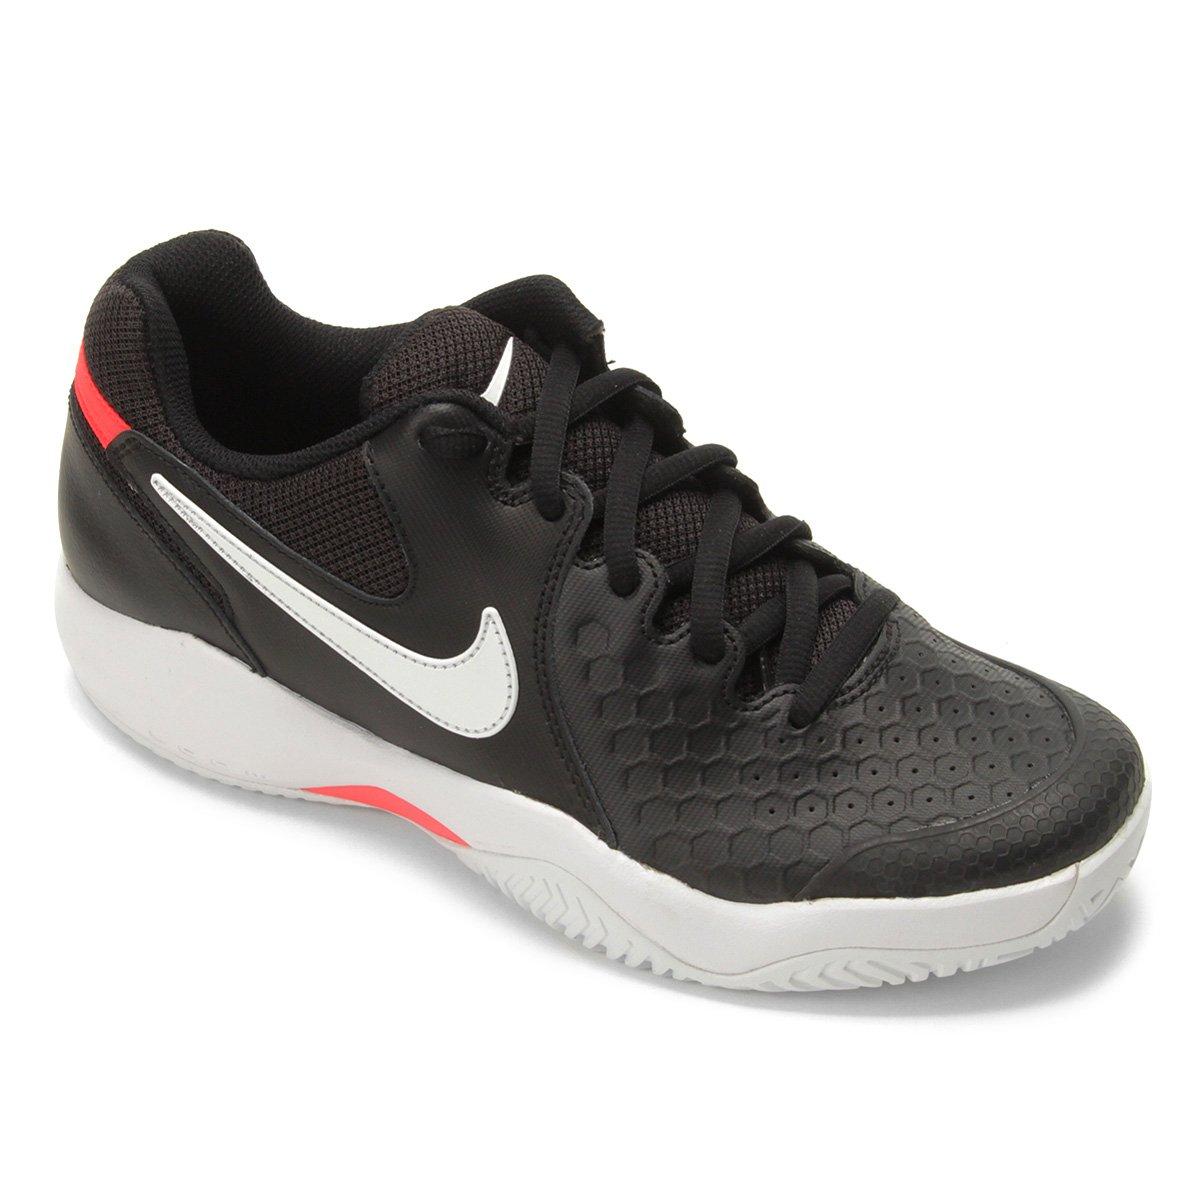 8ed8fb032b732 FornecedorNetshoes. Tênis Nike Air Zoom Couro Resistance Masculino